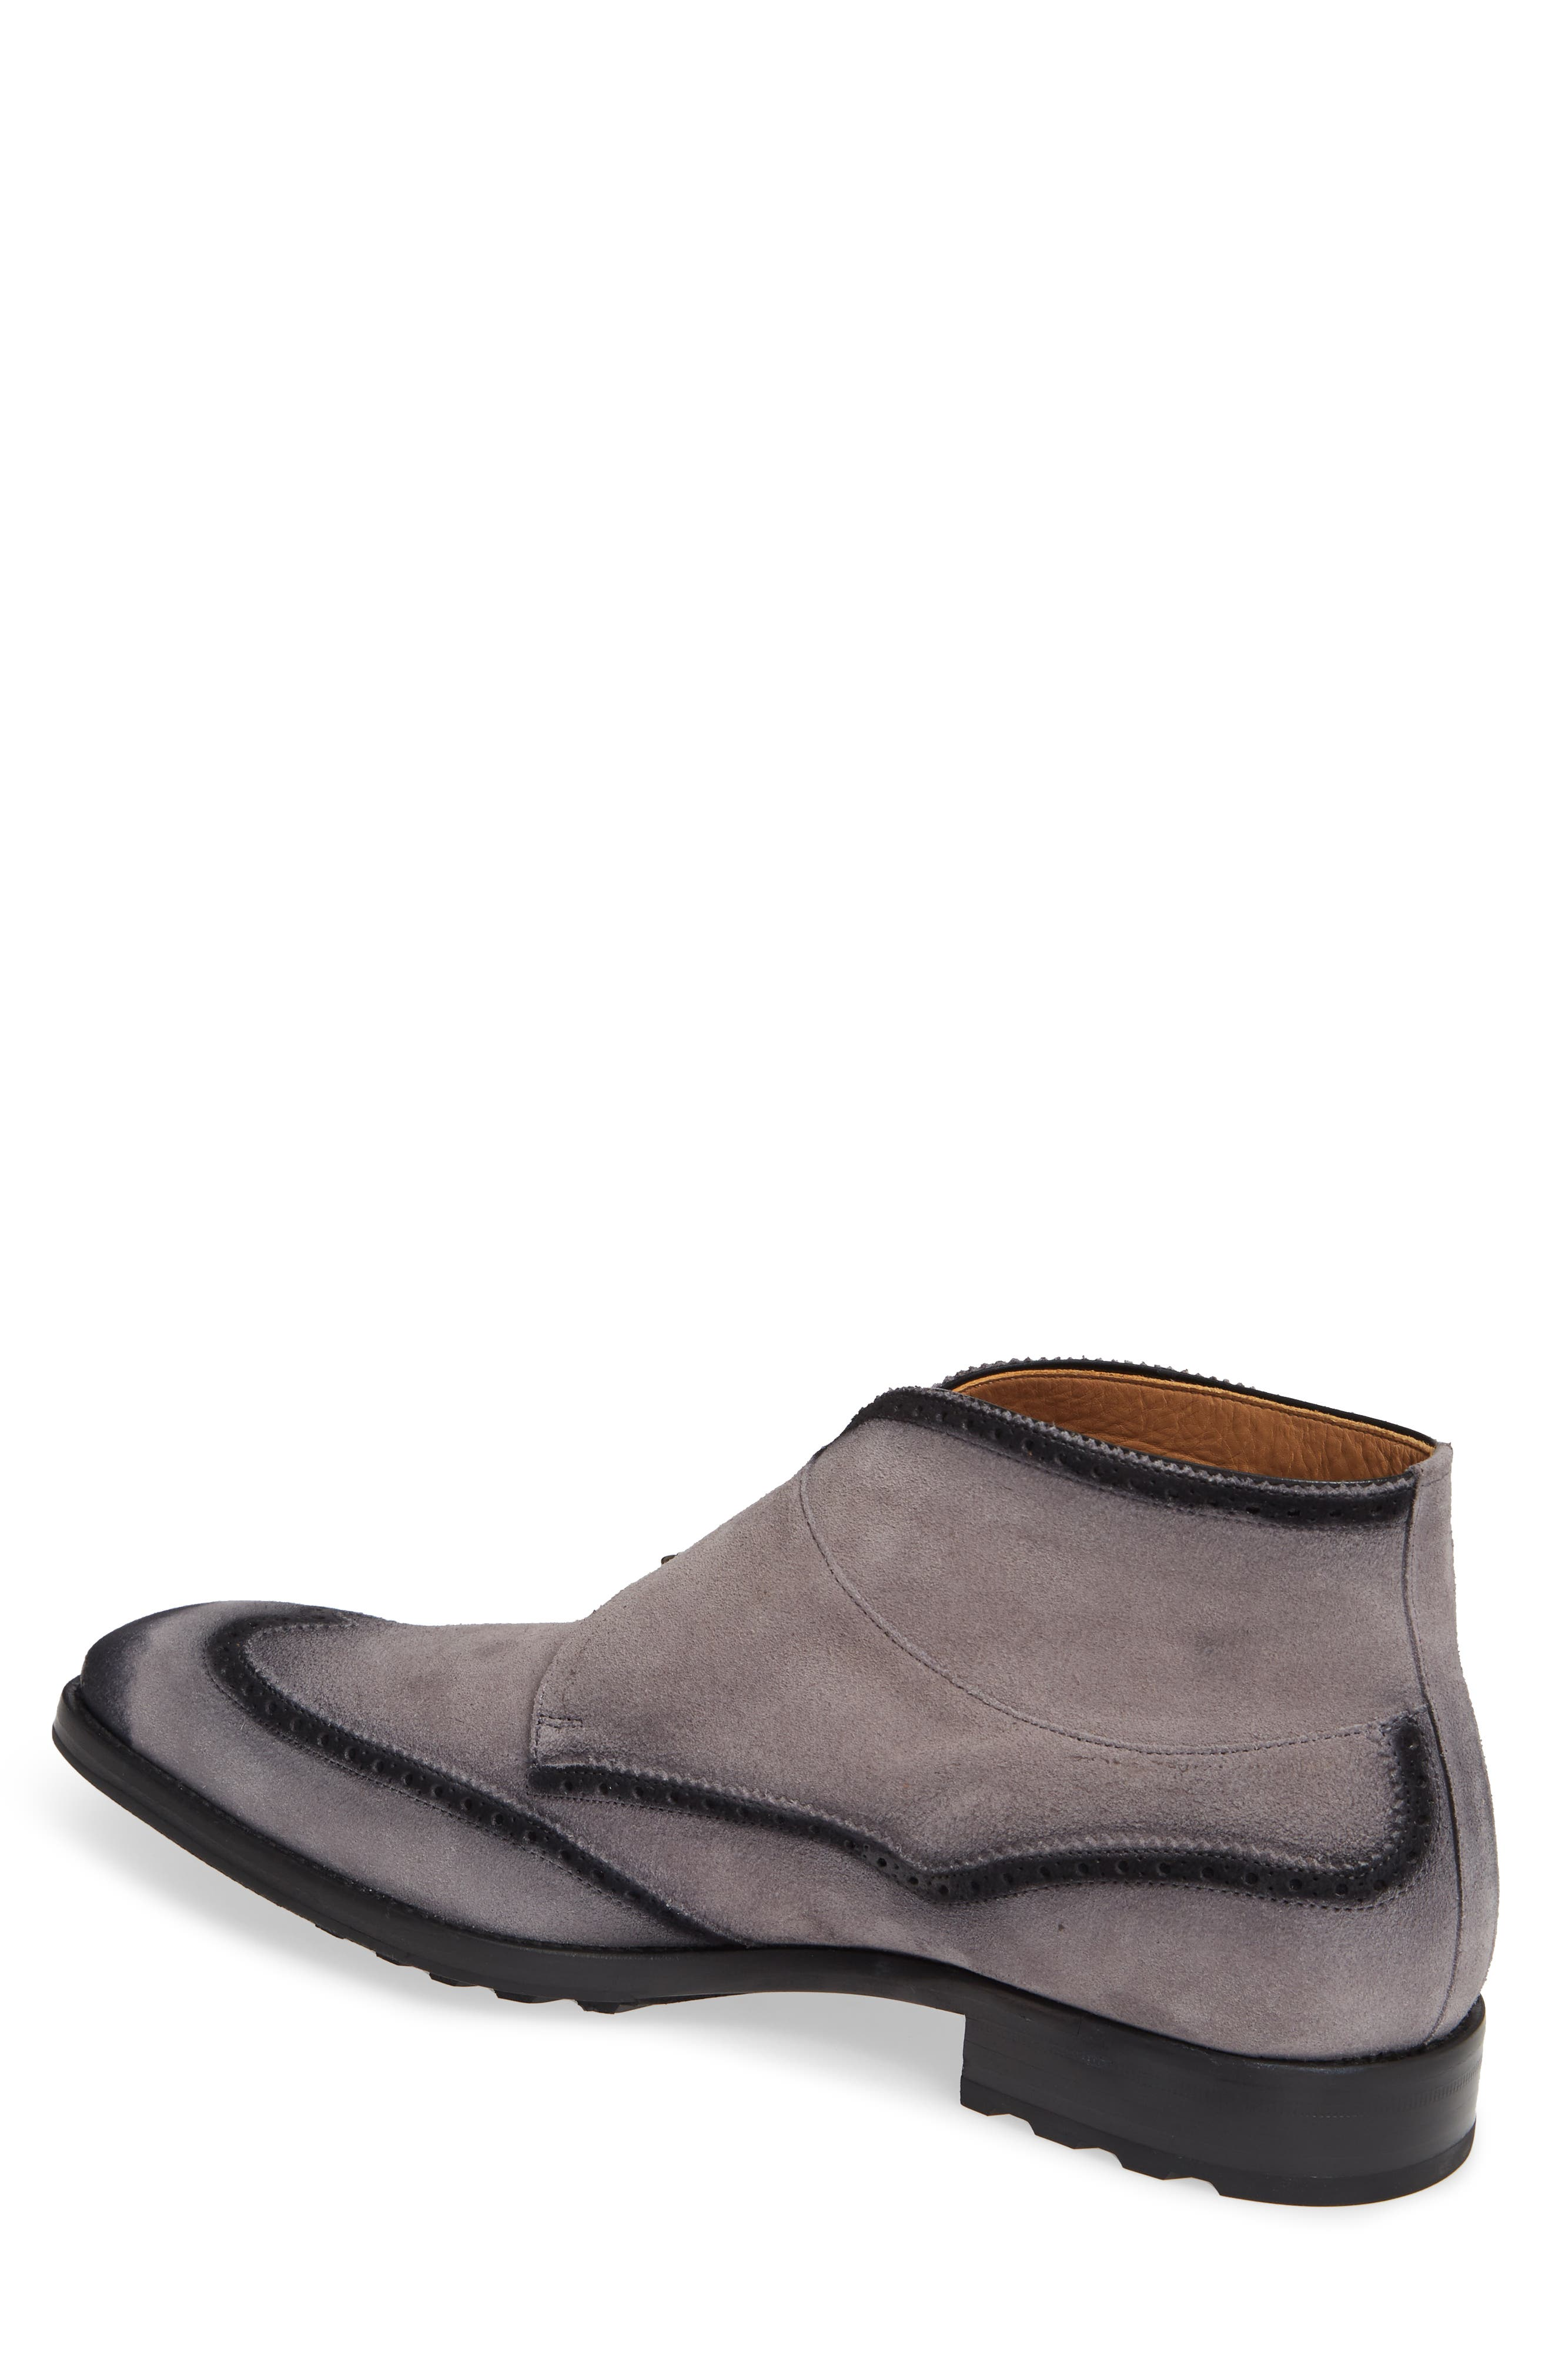 Munoz Double Monk Strap Boot,                             Alternate thumbnail 2, color,                             GREY SUEDE